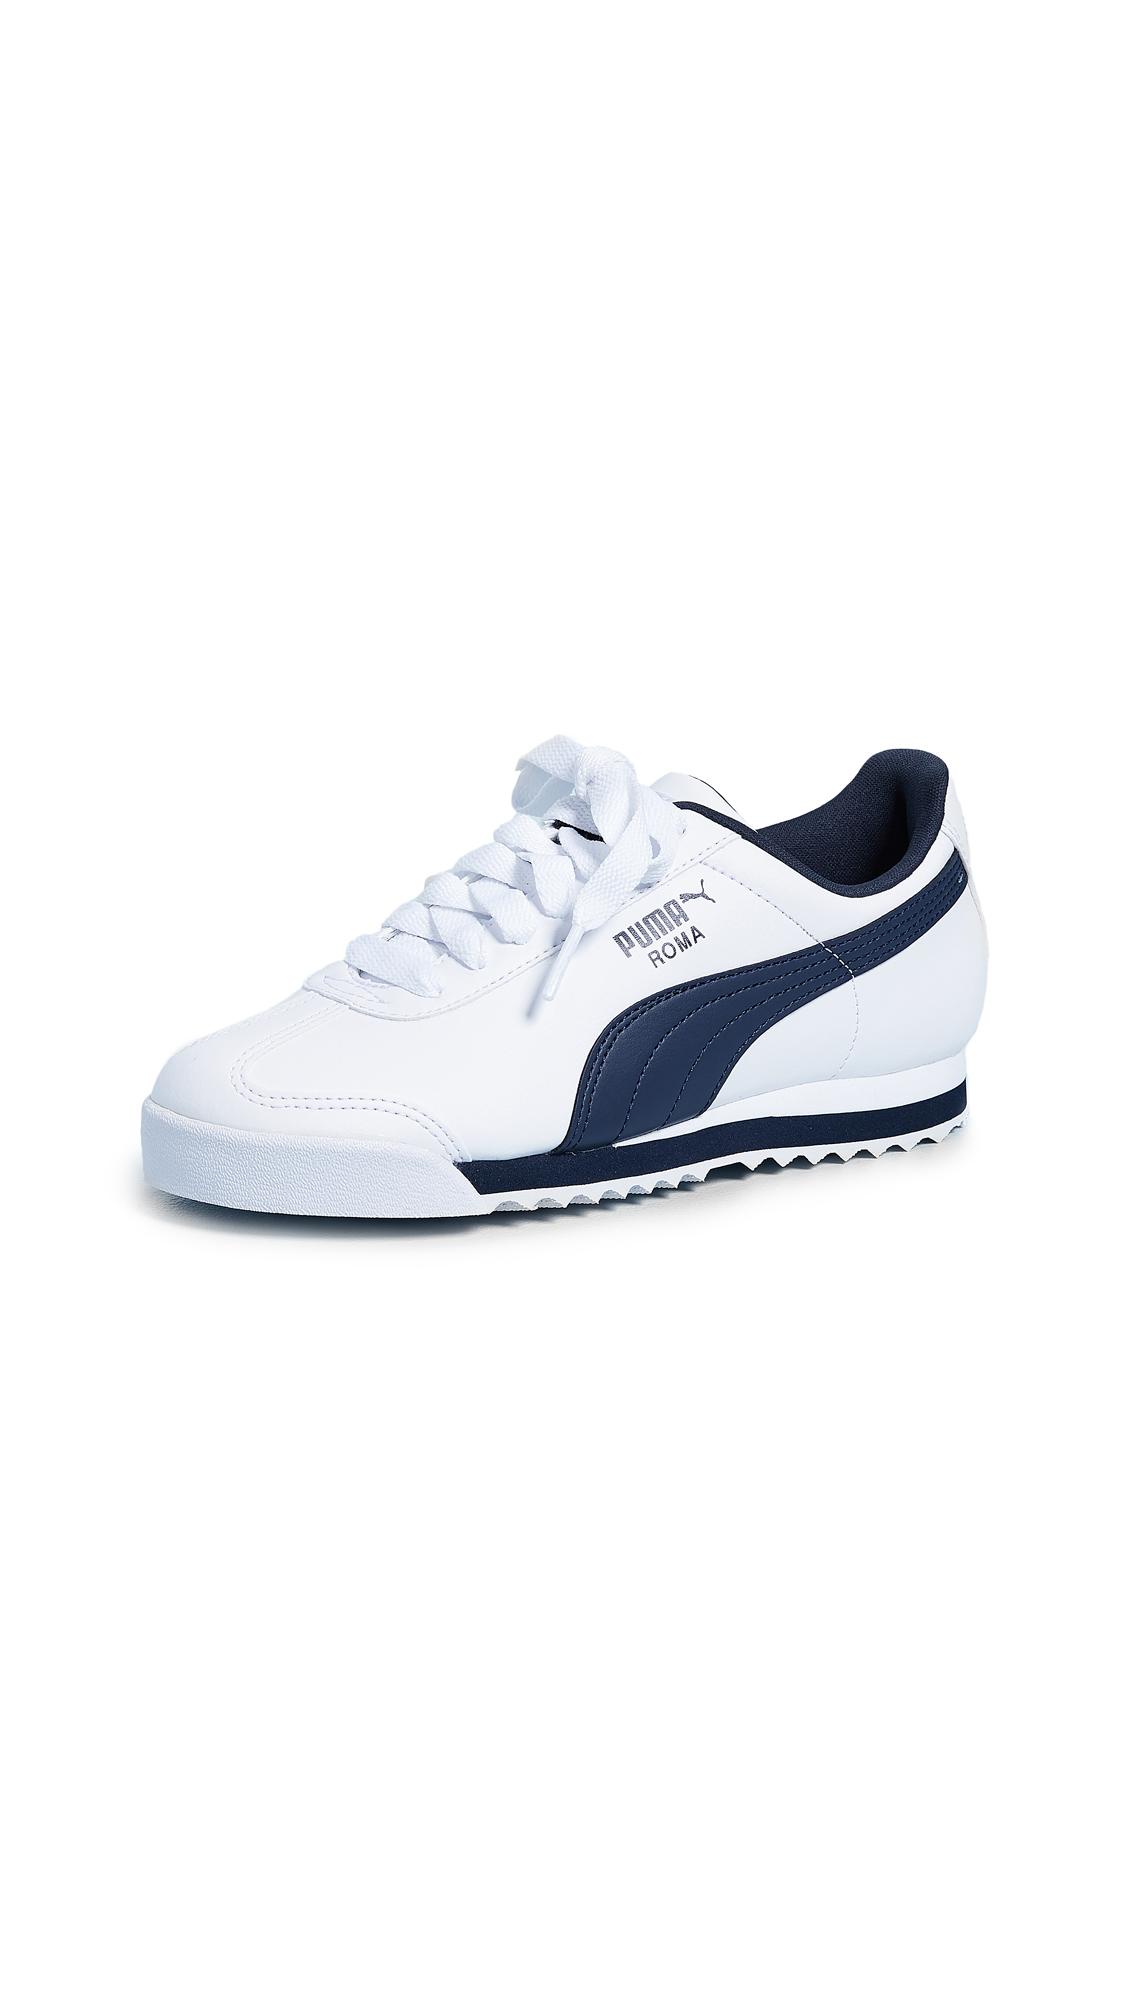 PUMA Roma Basic Sneakers - White/New Navy